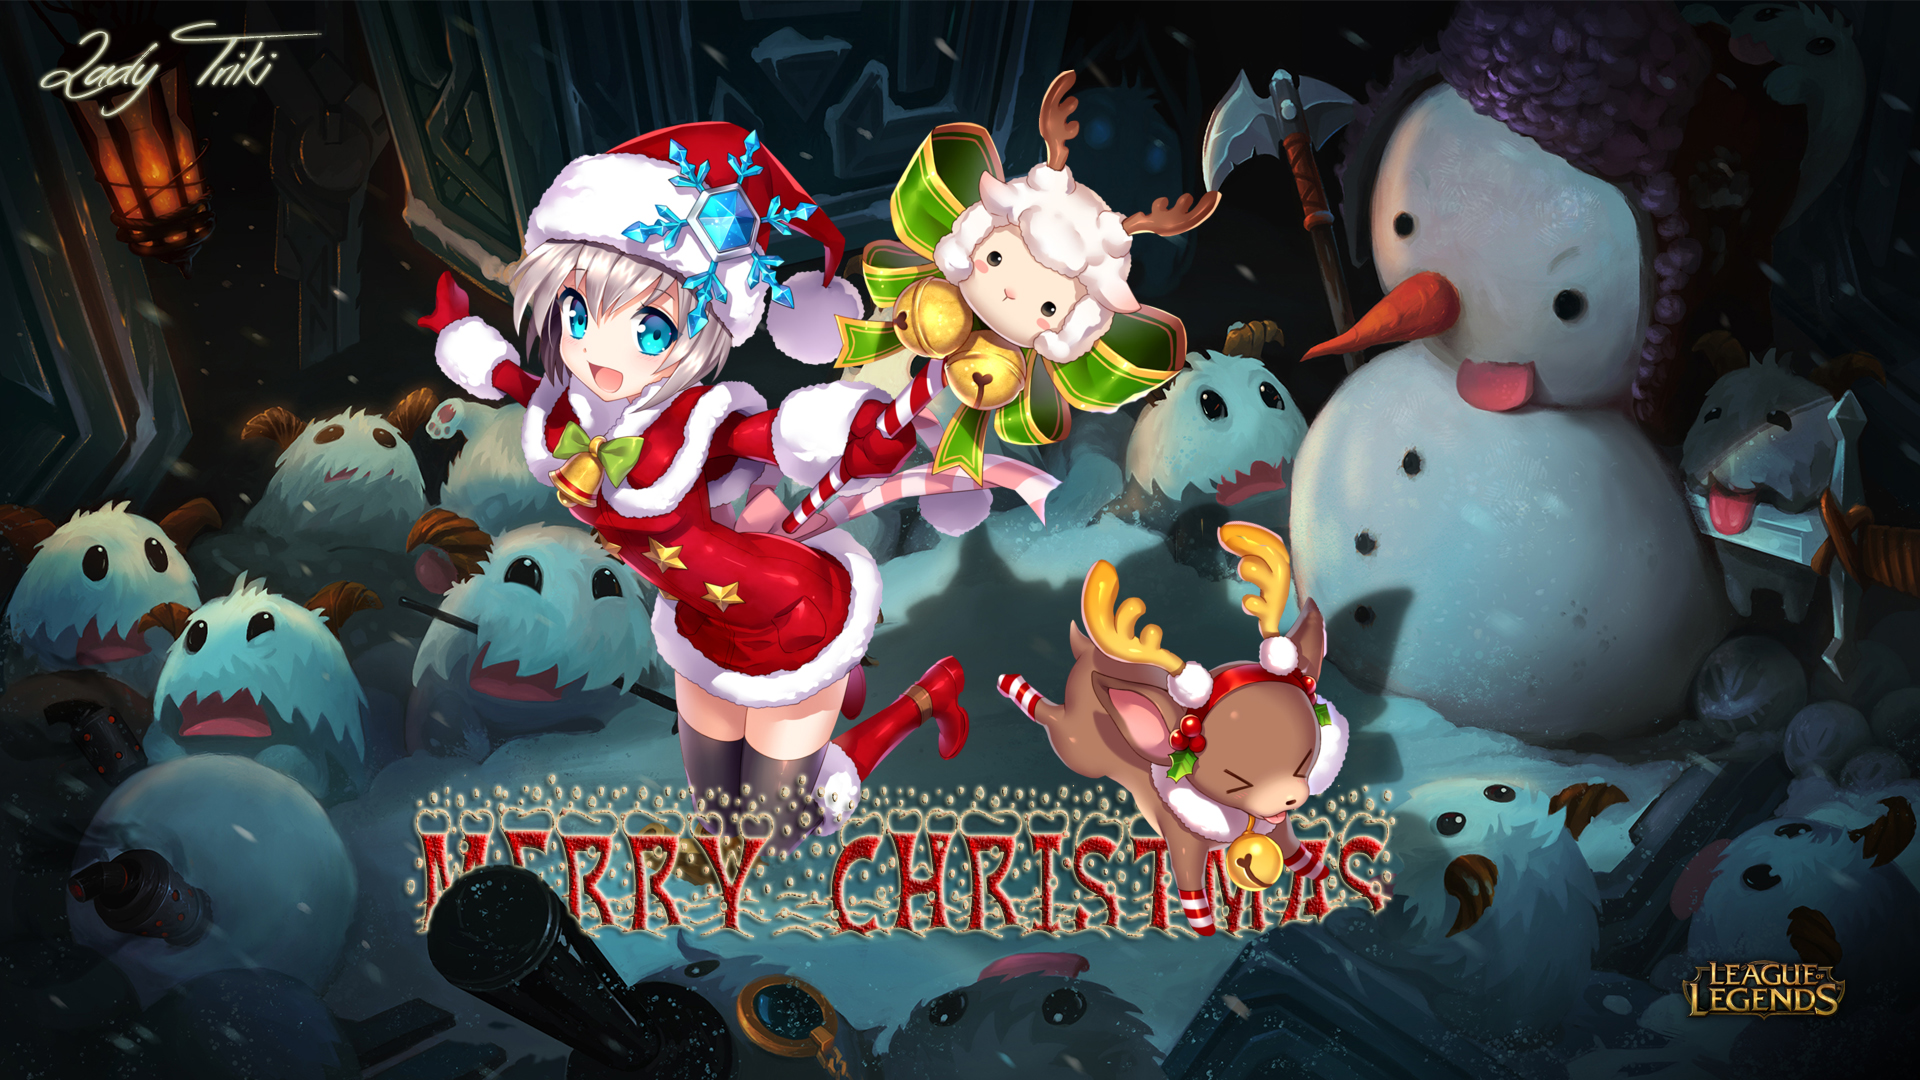 merry christmas league of legends! - wallpaperladytriki on